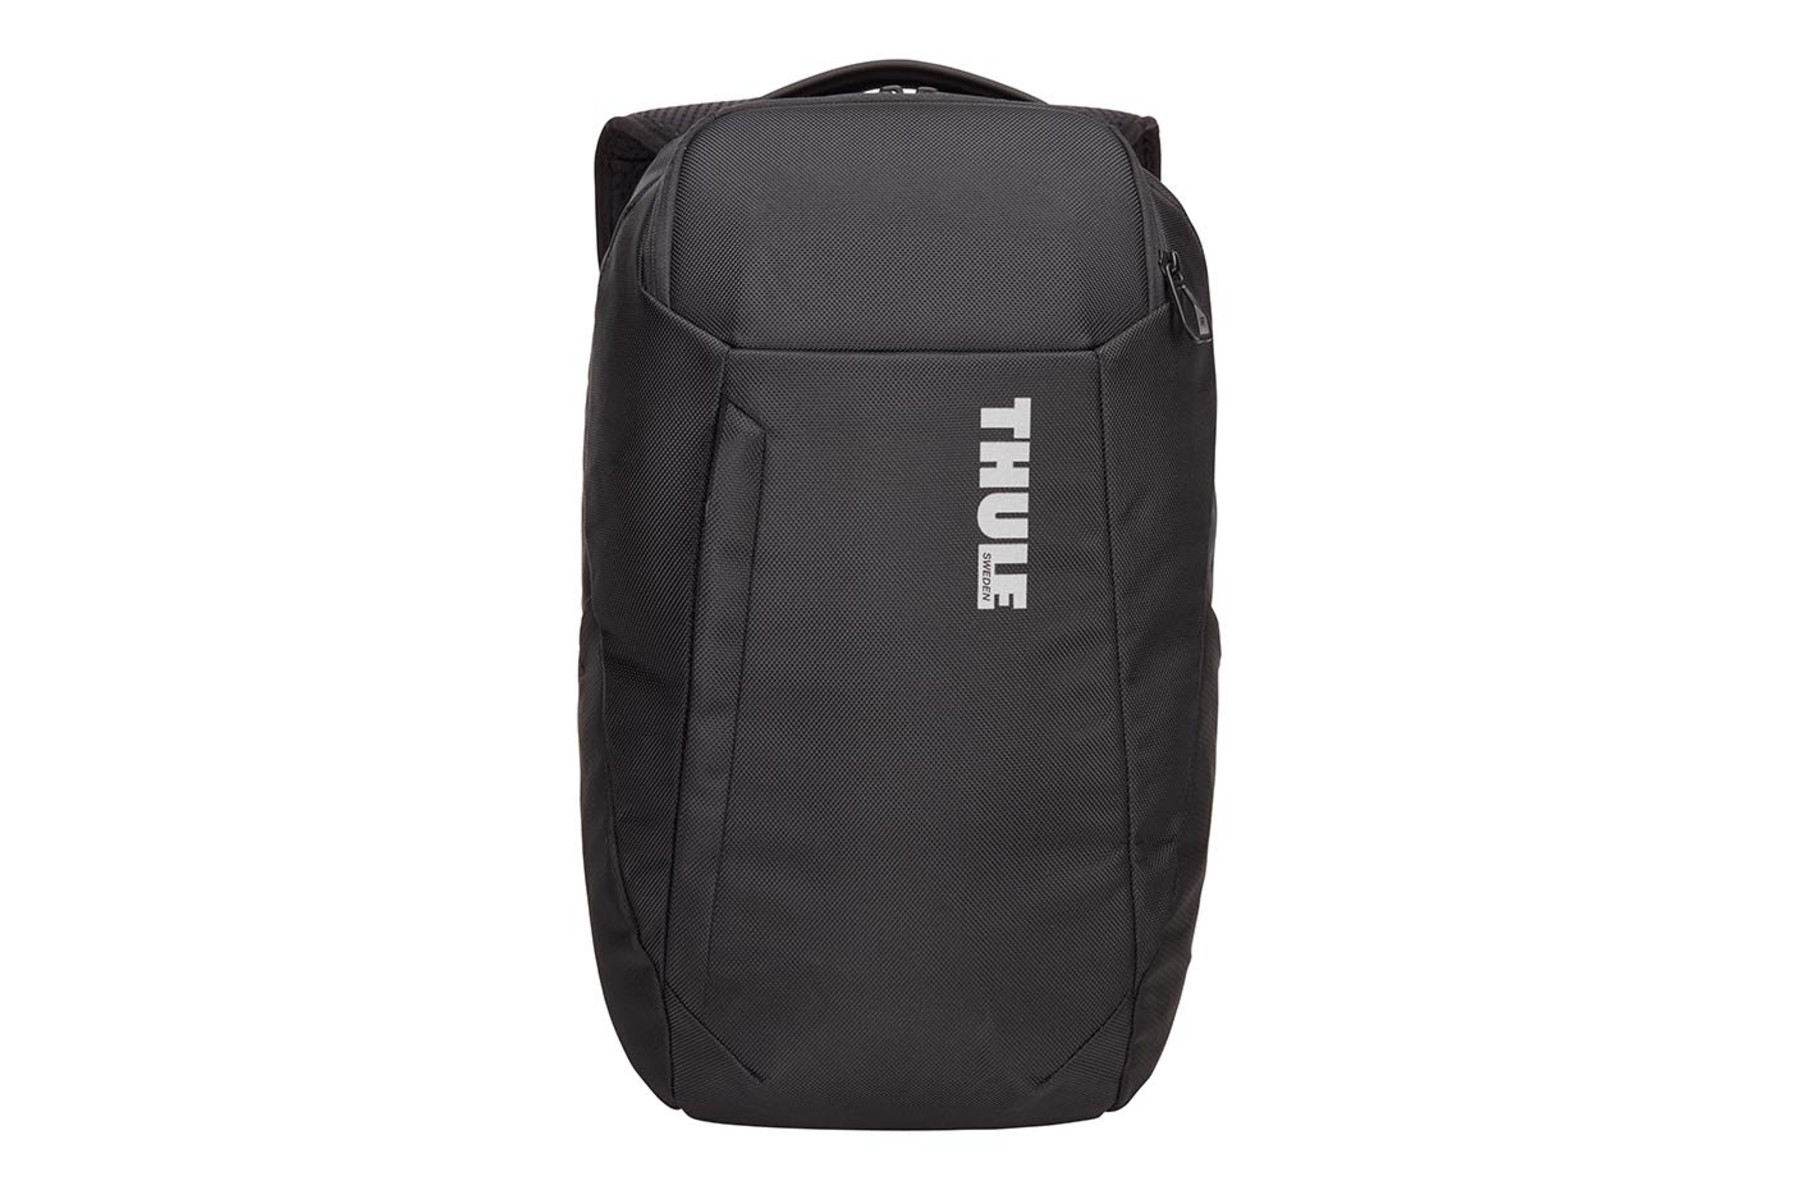 Рюкзак Thule Accent черный 20 л